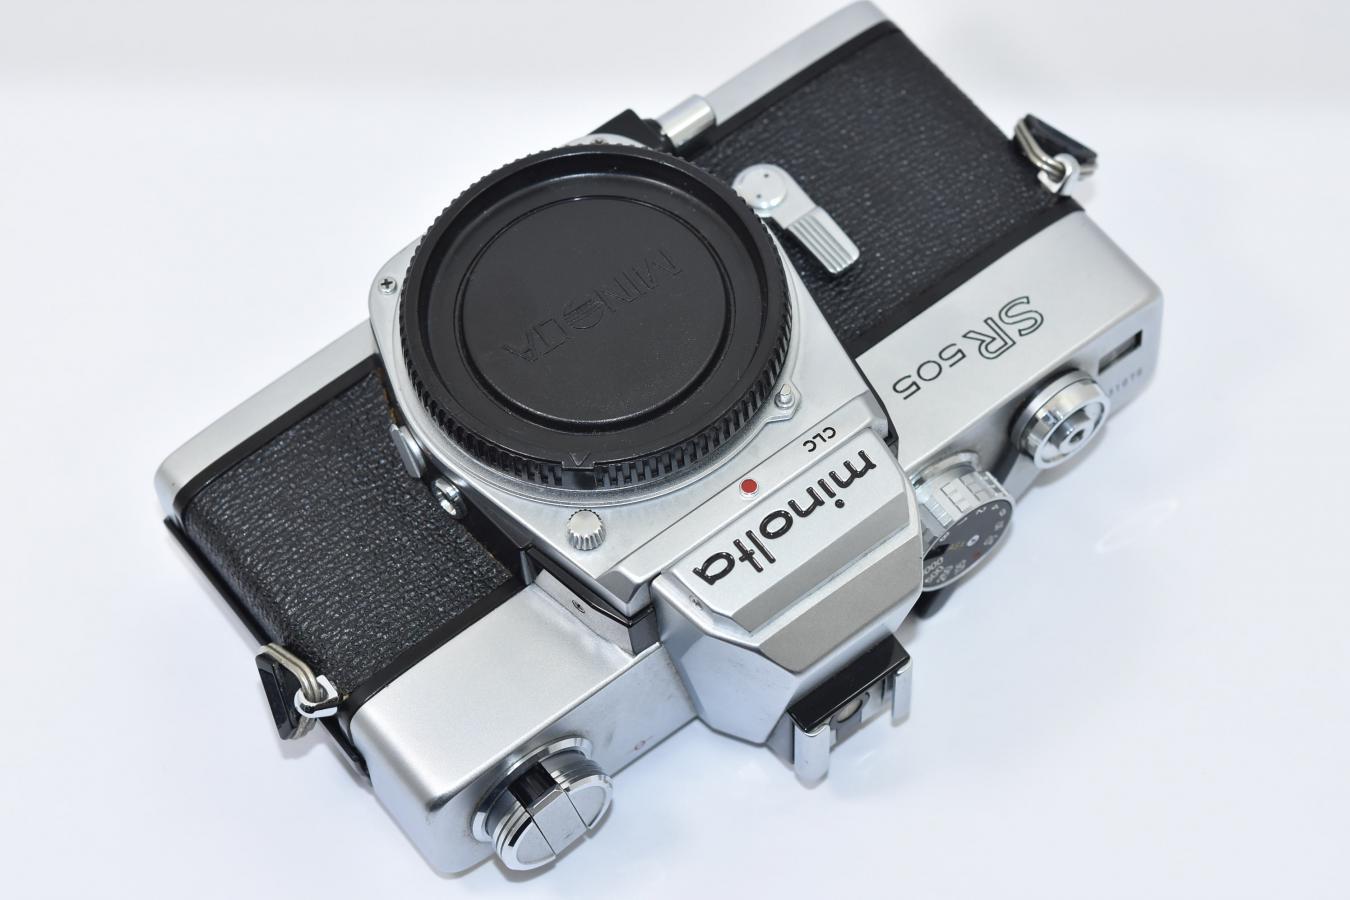 【B級特価品】 minolta SR505 【モルト交換済】